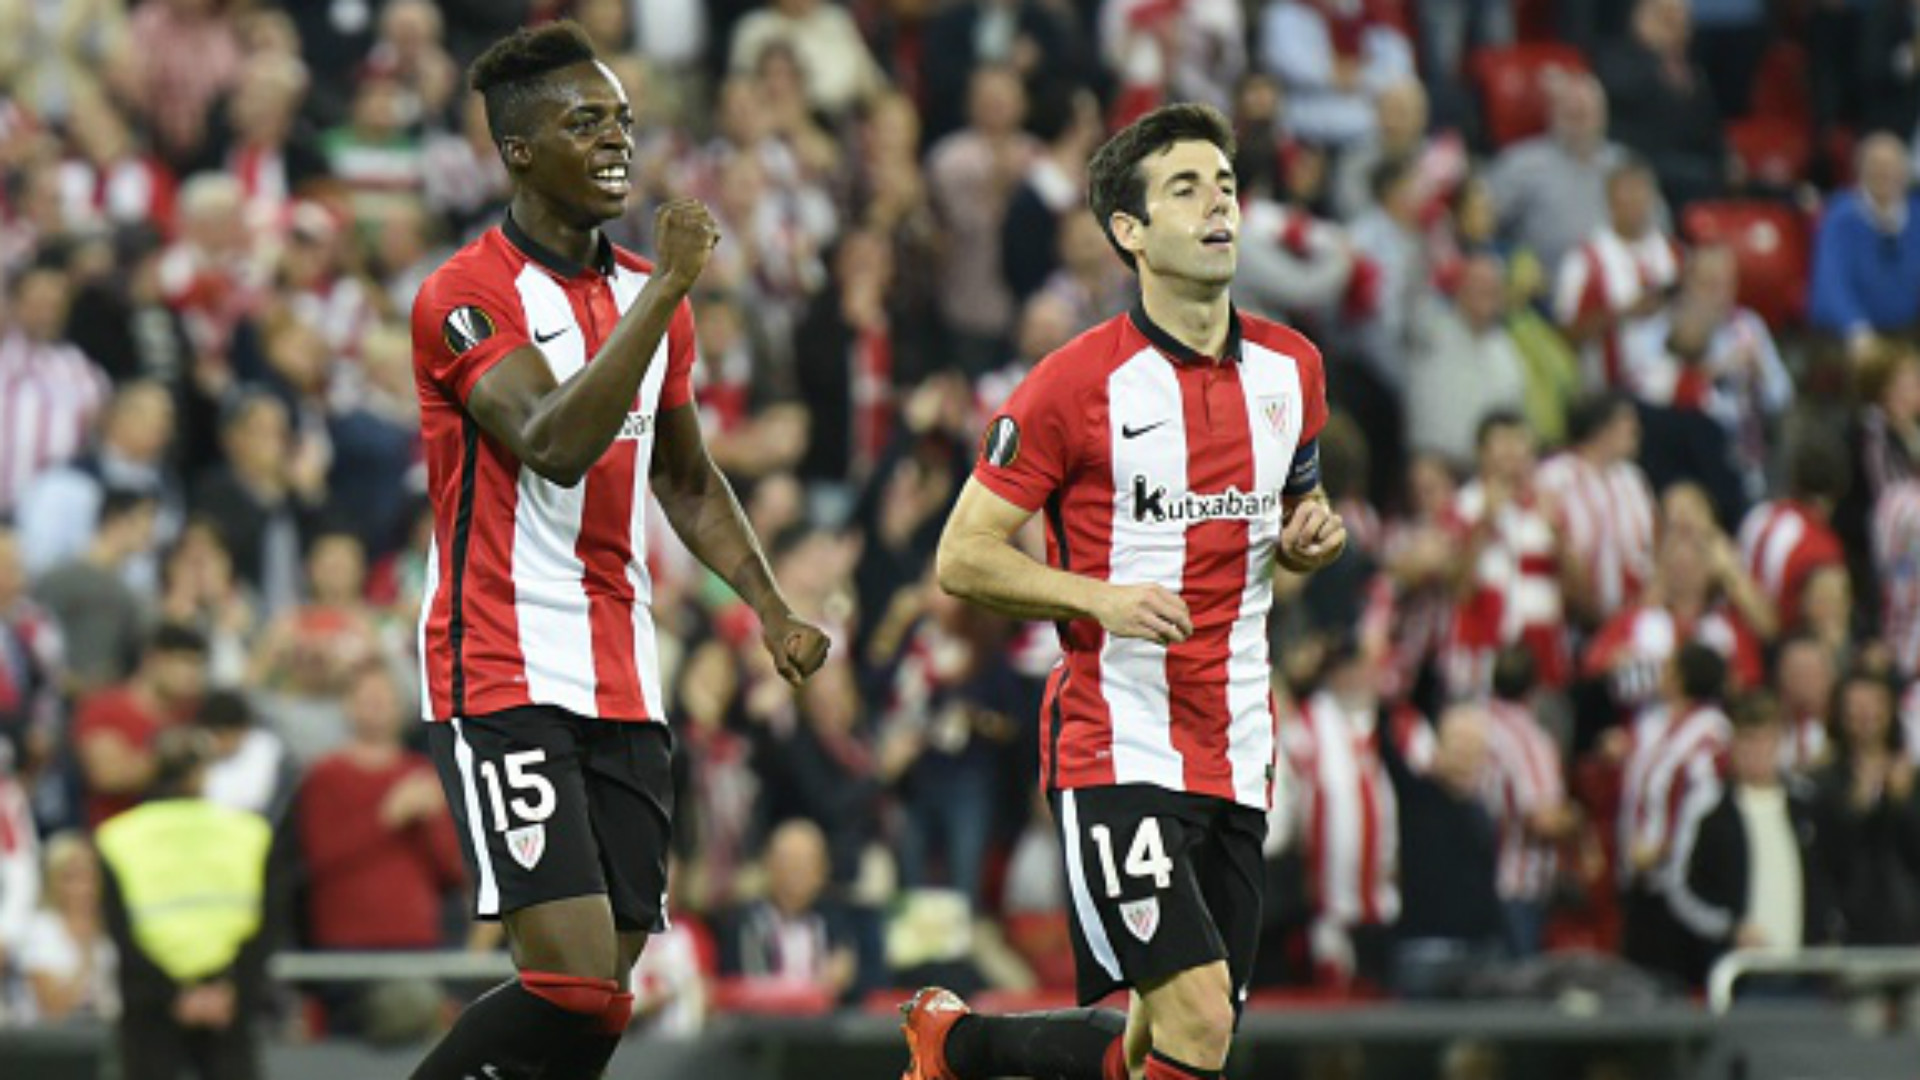 Video: Athletic Bilbao vs Levante